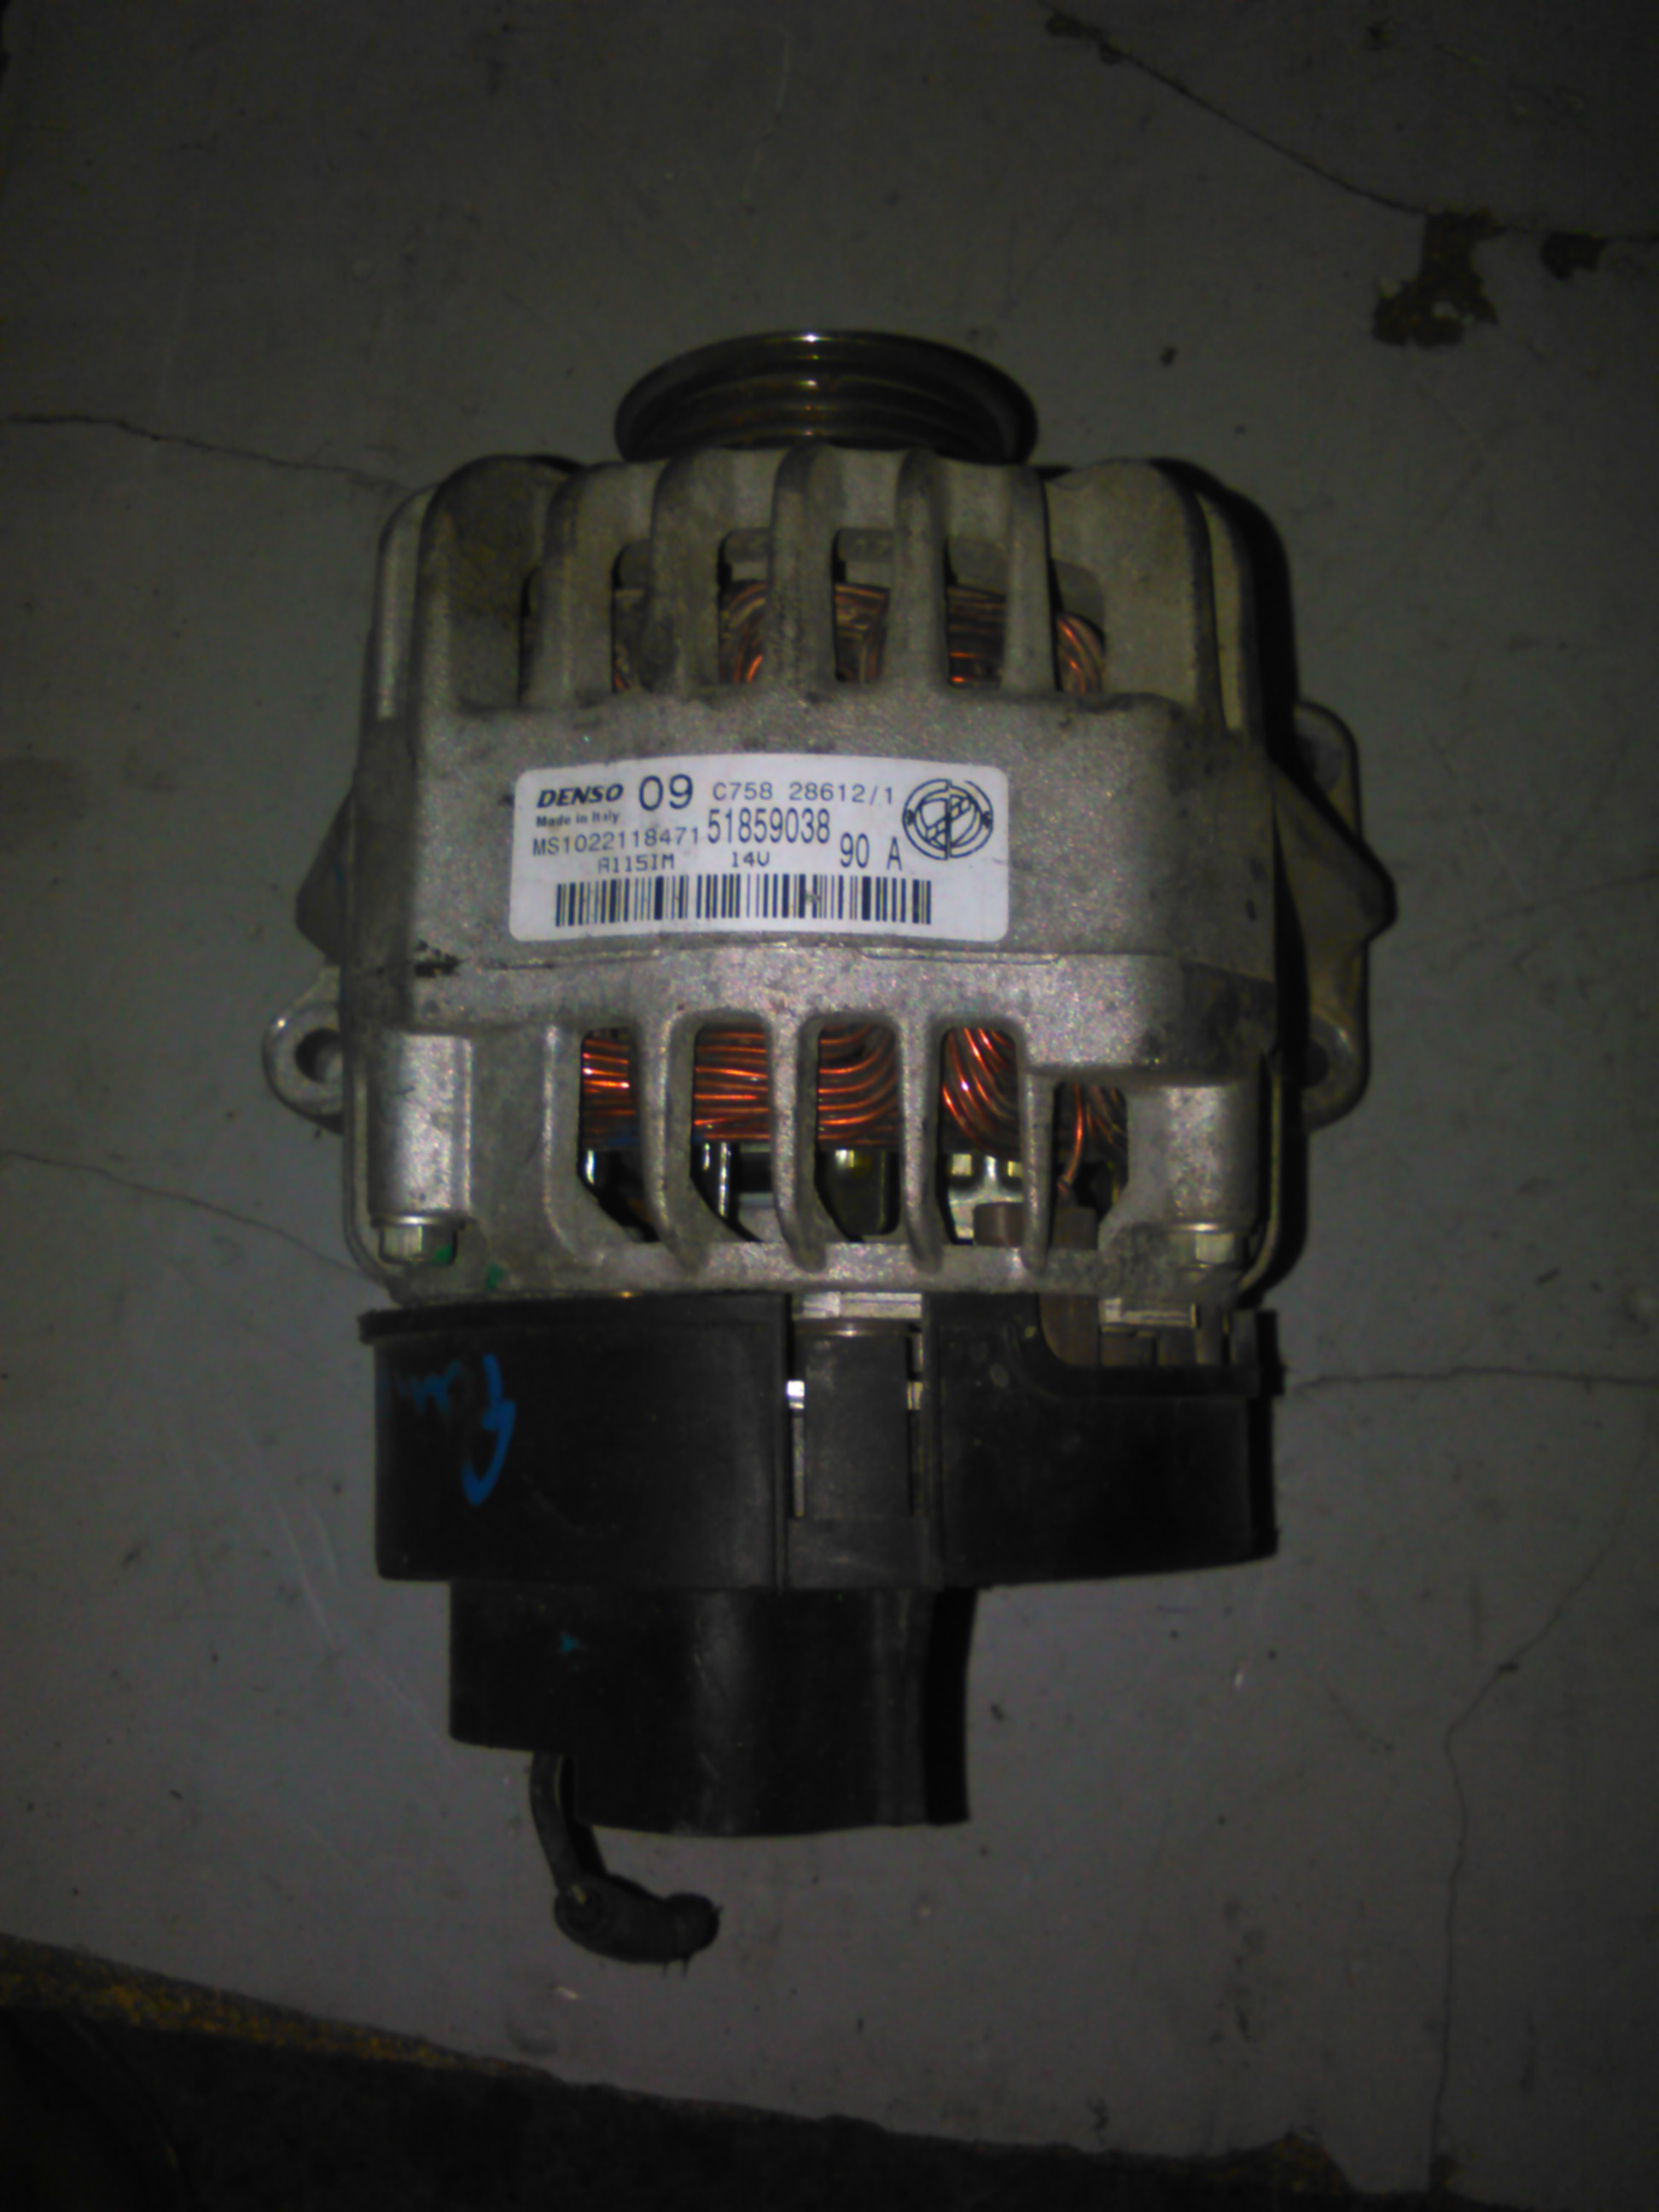 Alternator Fiat Punto 1.2, 1.4 motor 169A4000 cod ms1022118471